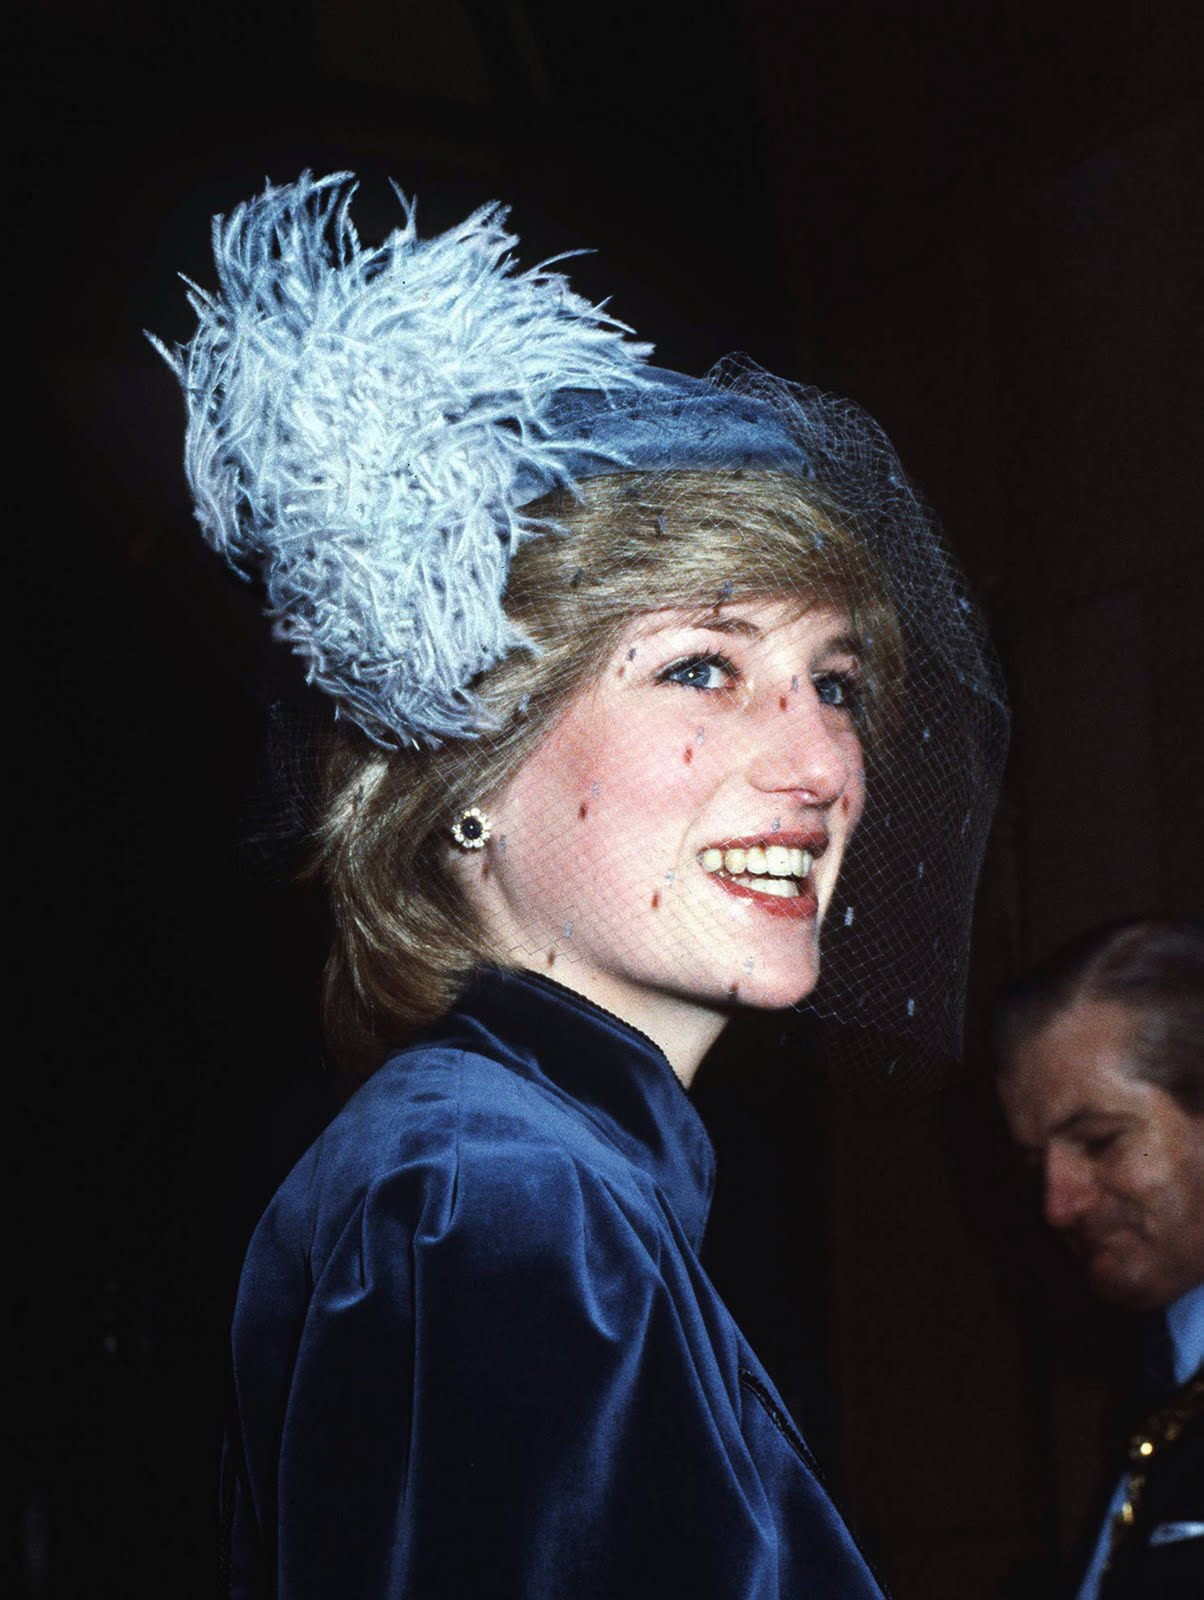 http://1.bp.blogspot.com/-Rc3PUiLZ-5U/TimbzBswKSI/AAAAAAAAAM4/s4ICVpbMnlA/s1600/princess_diana+1982.jpg